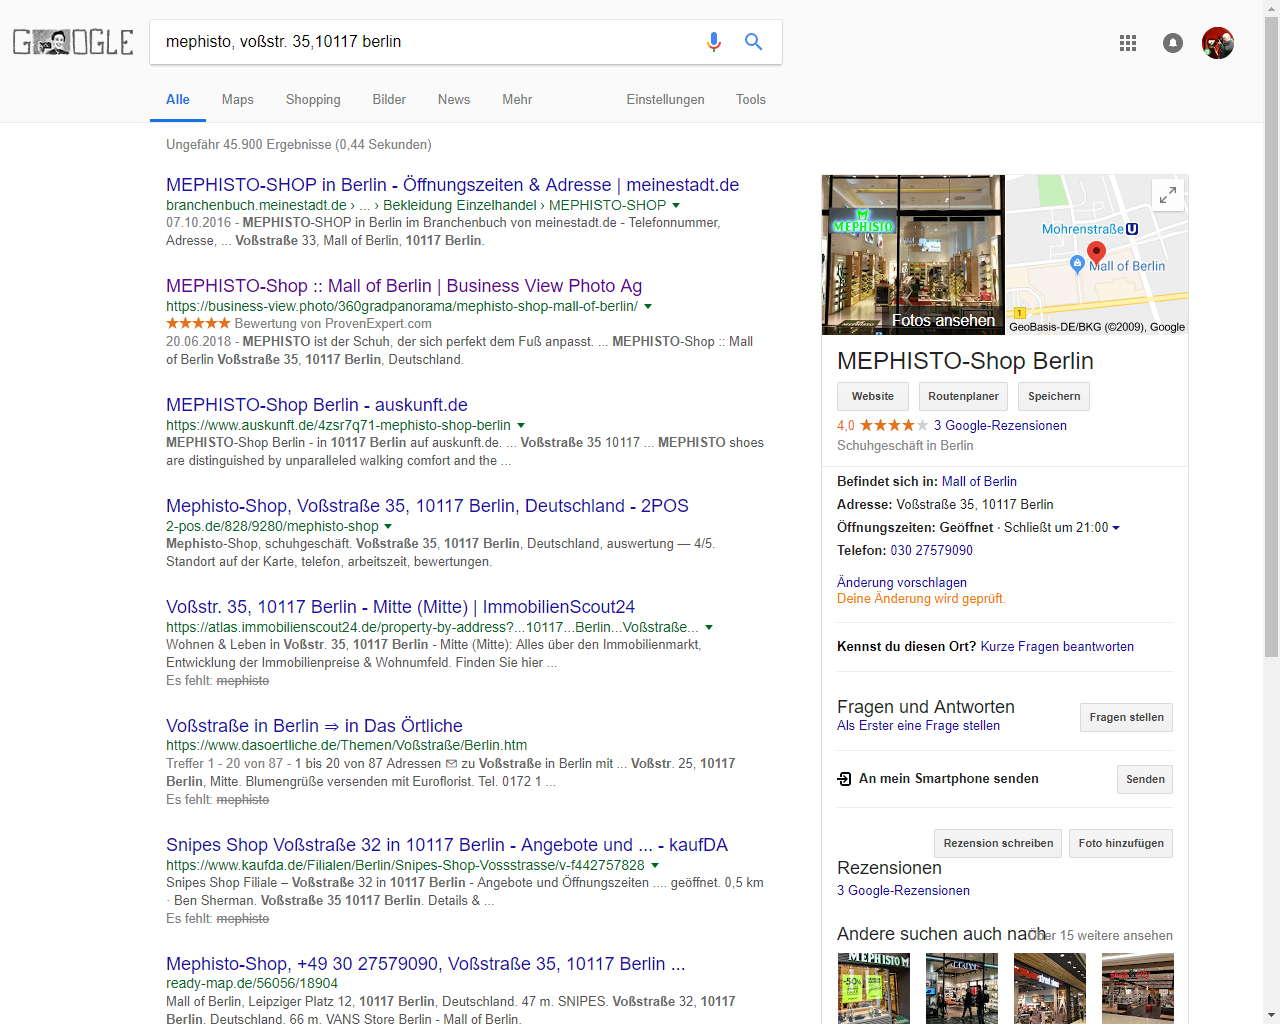 Google Suchmaschine mephisto berlin